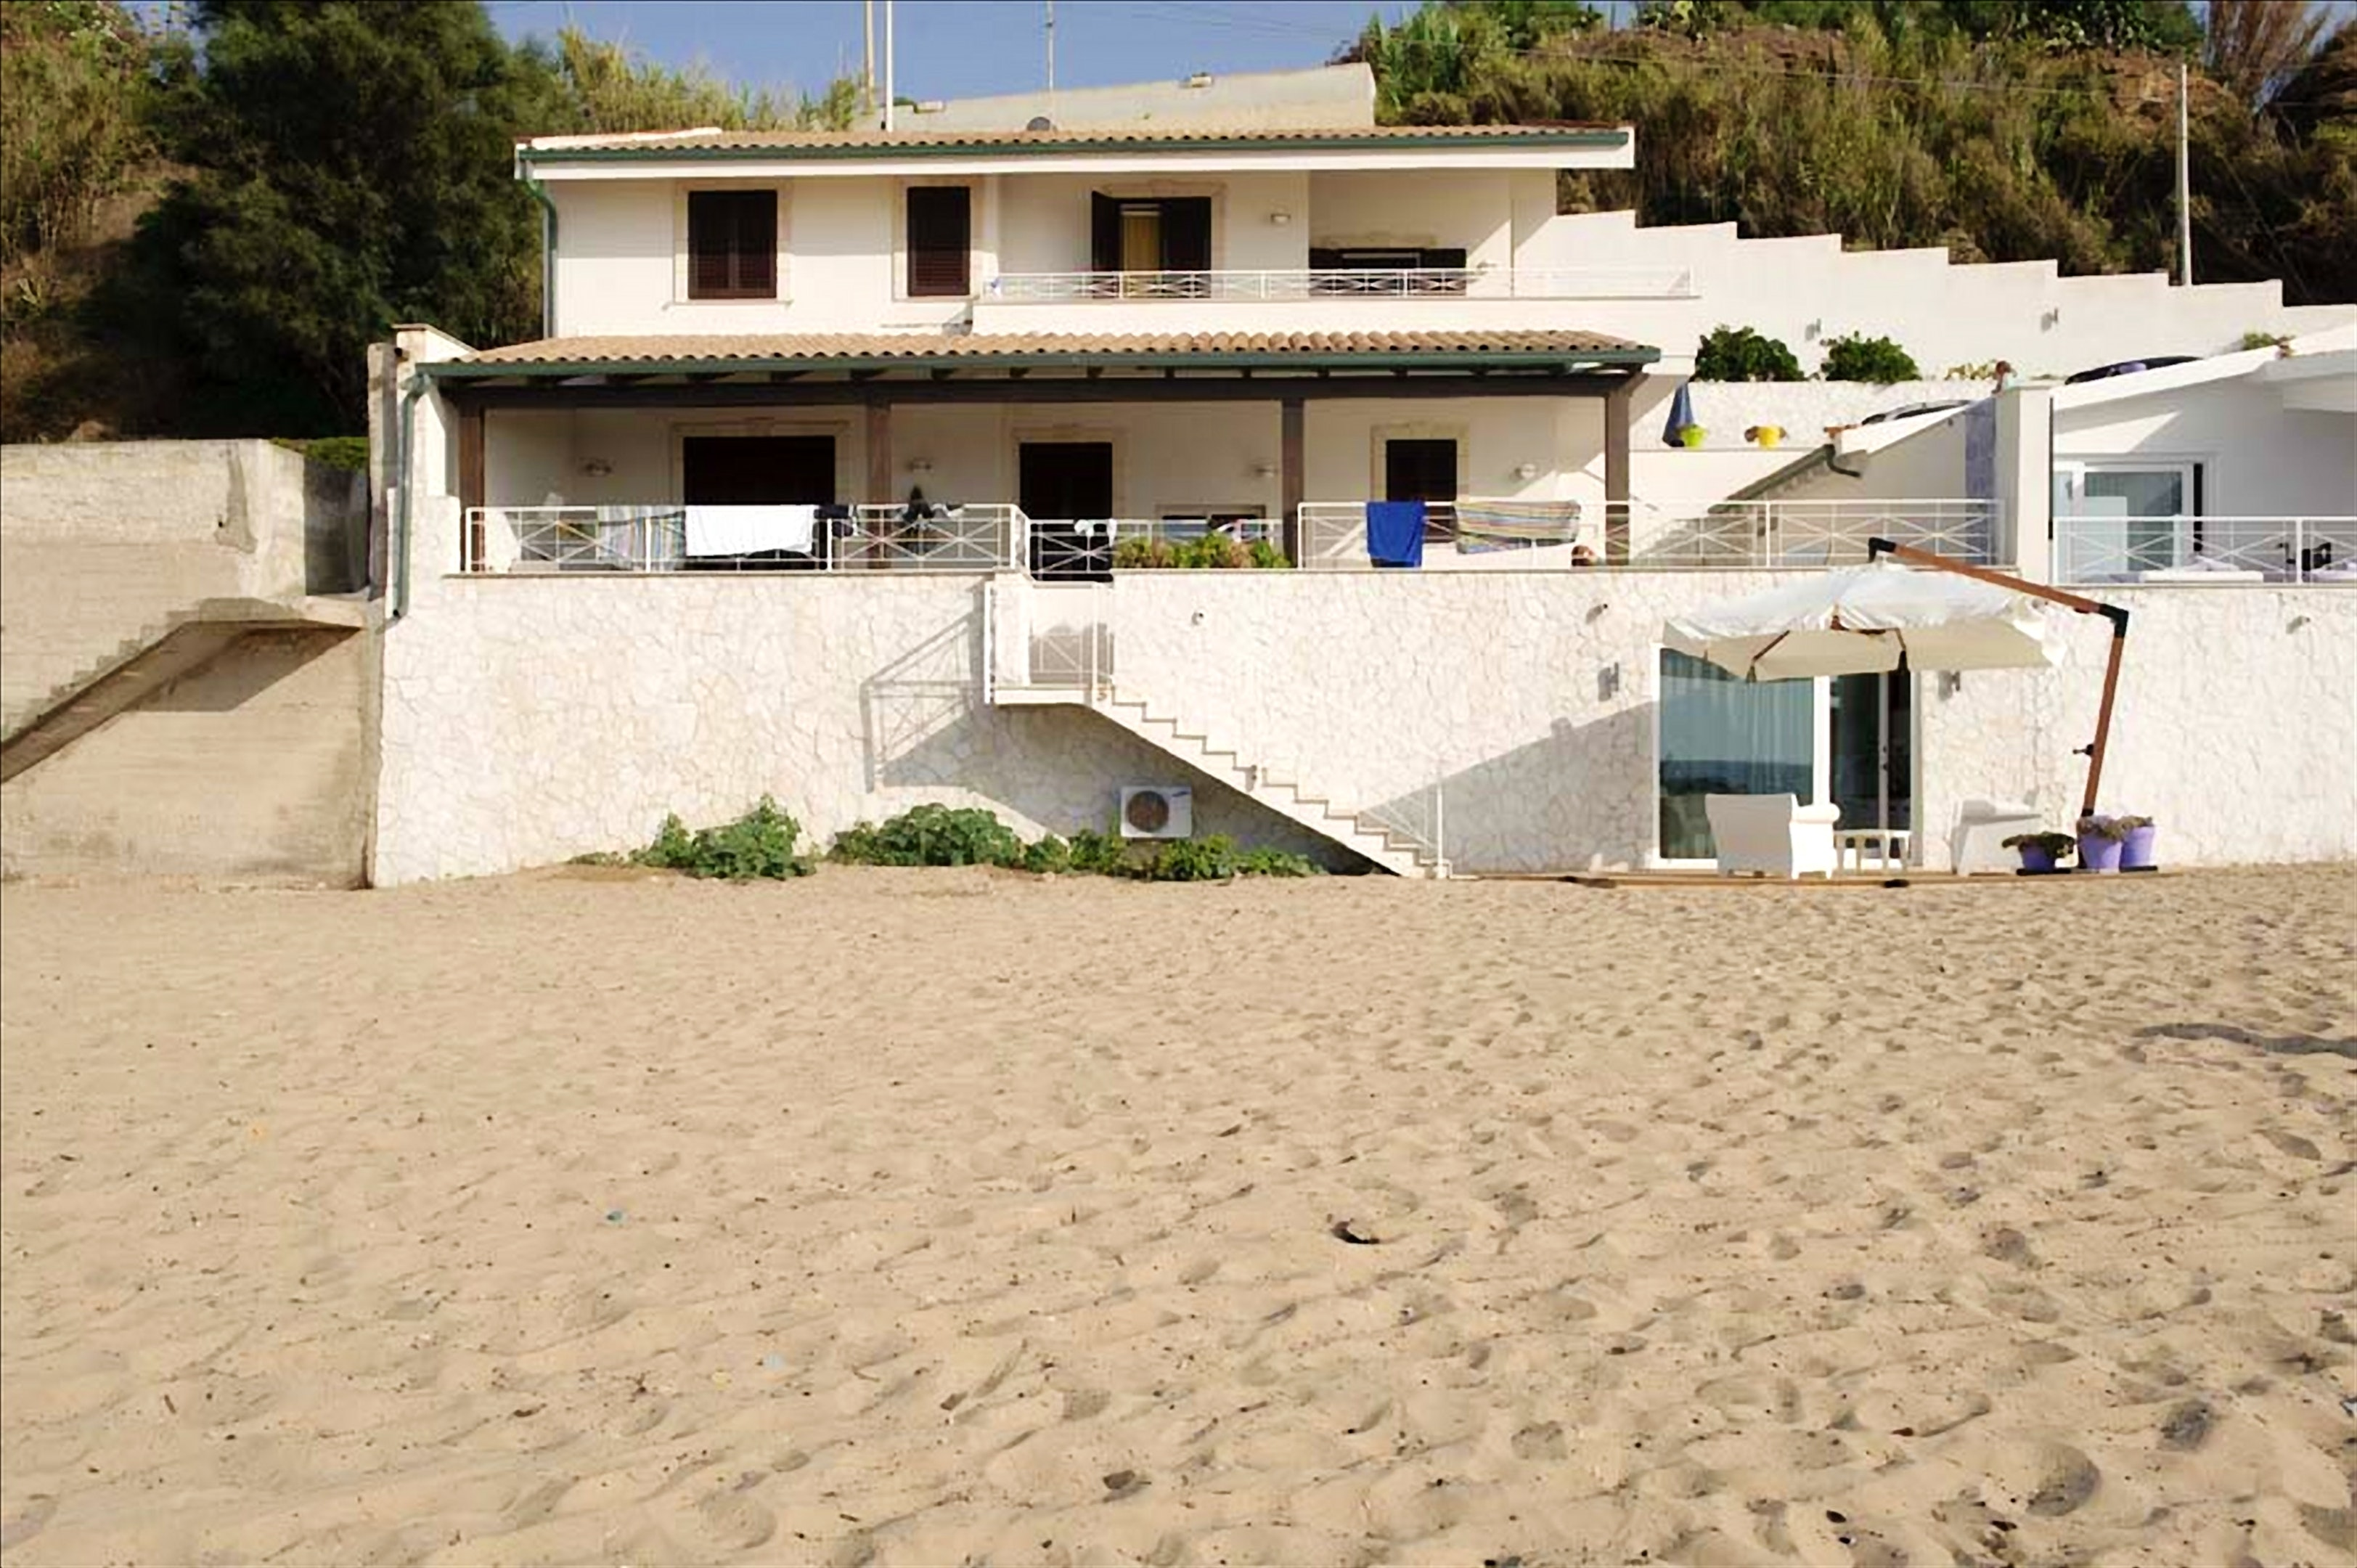 Holiday apartment Wohnung mit 4 Schlafzimmern in Piano di Trappeto mit herrlichem Meerblick, möblierter Terr (2236750), Balestrate, Palermo, Sicily, Italy, picture 24